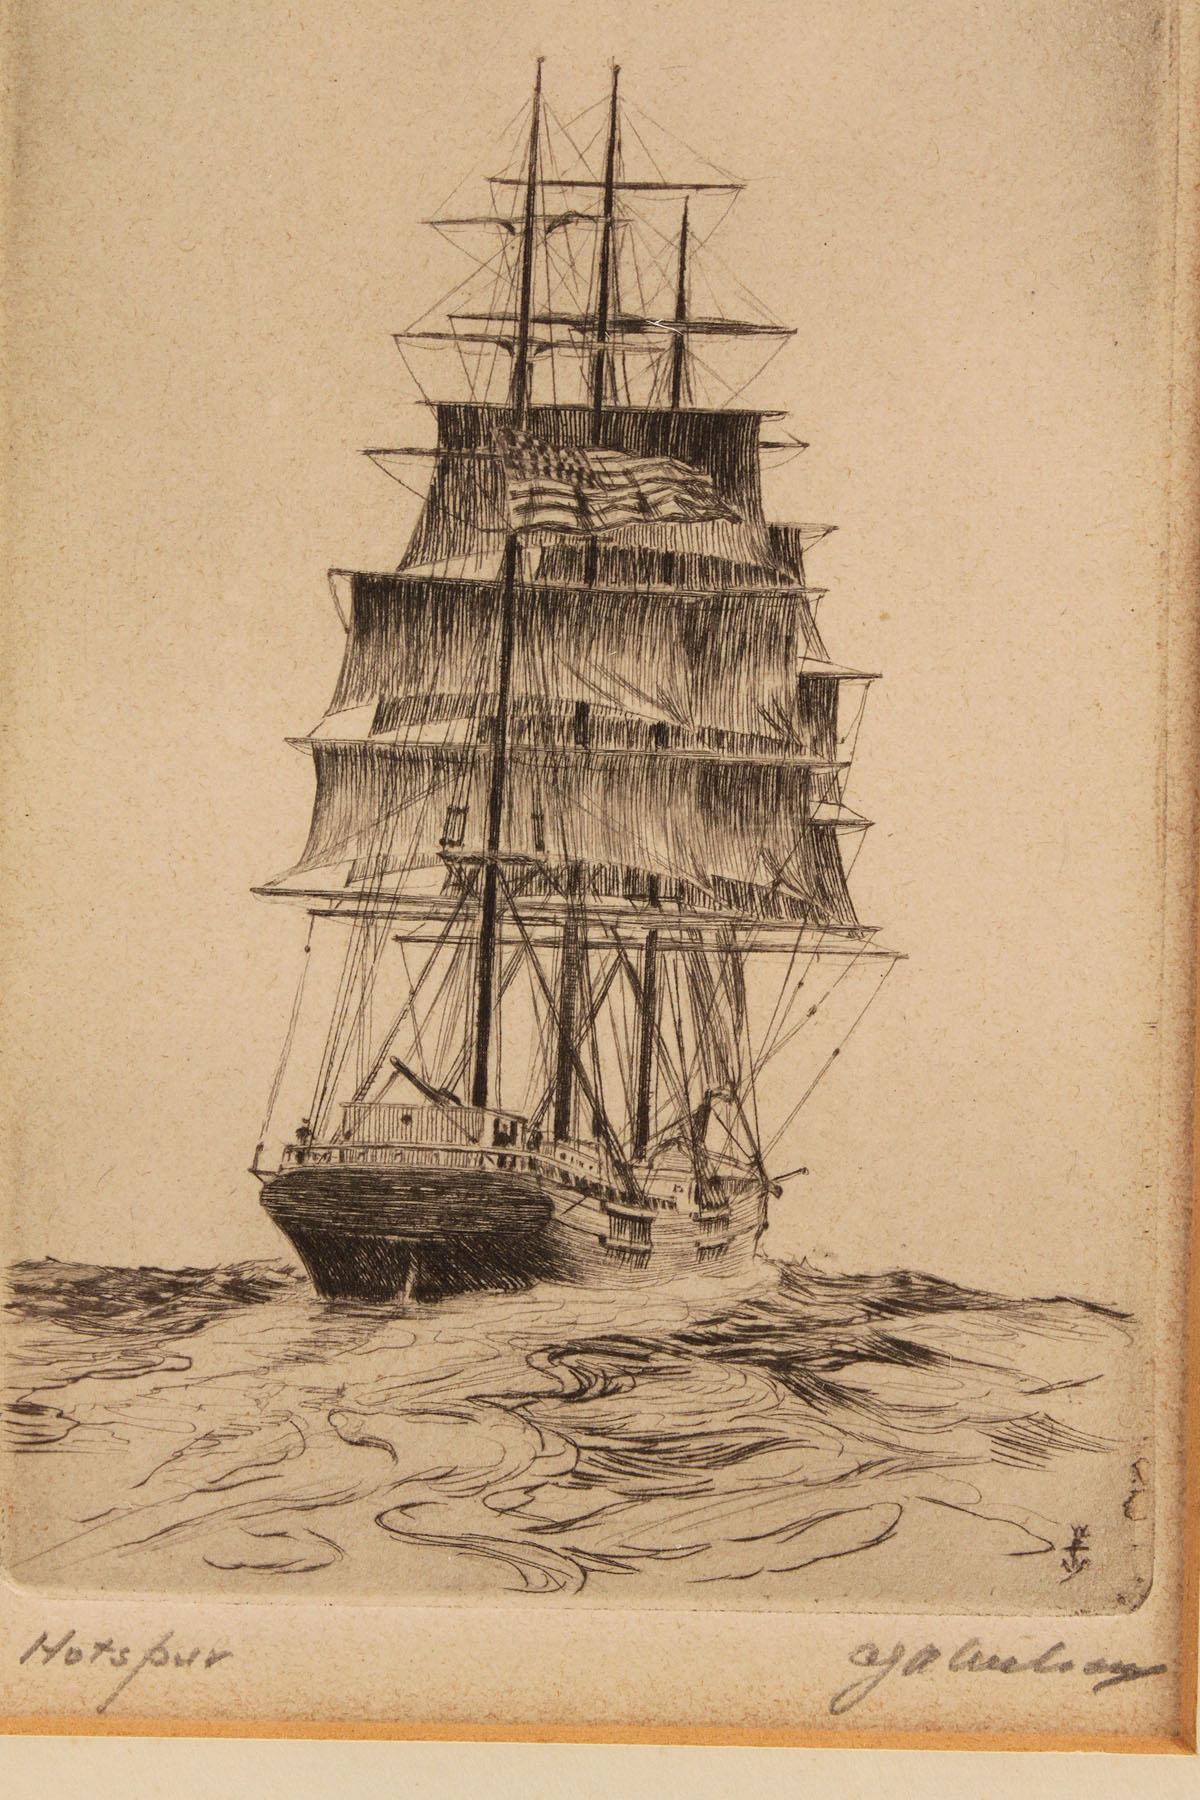 Lot 368a 4 Ship Etchings 2 Wilson 1 Mcgrath 1 Owen